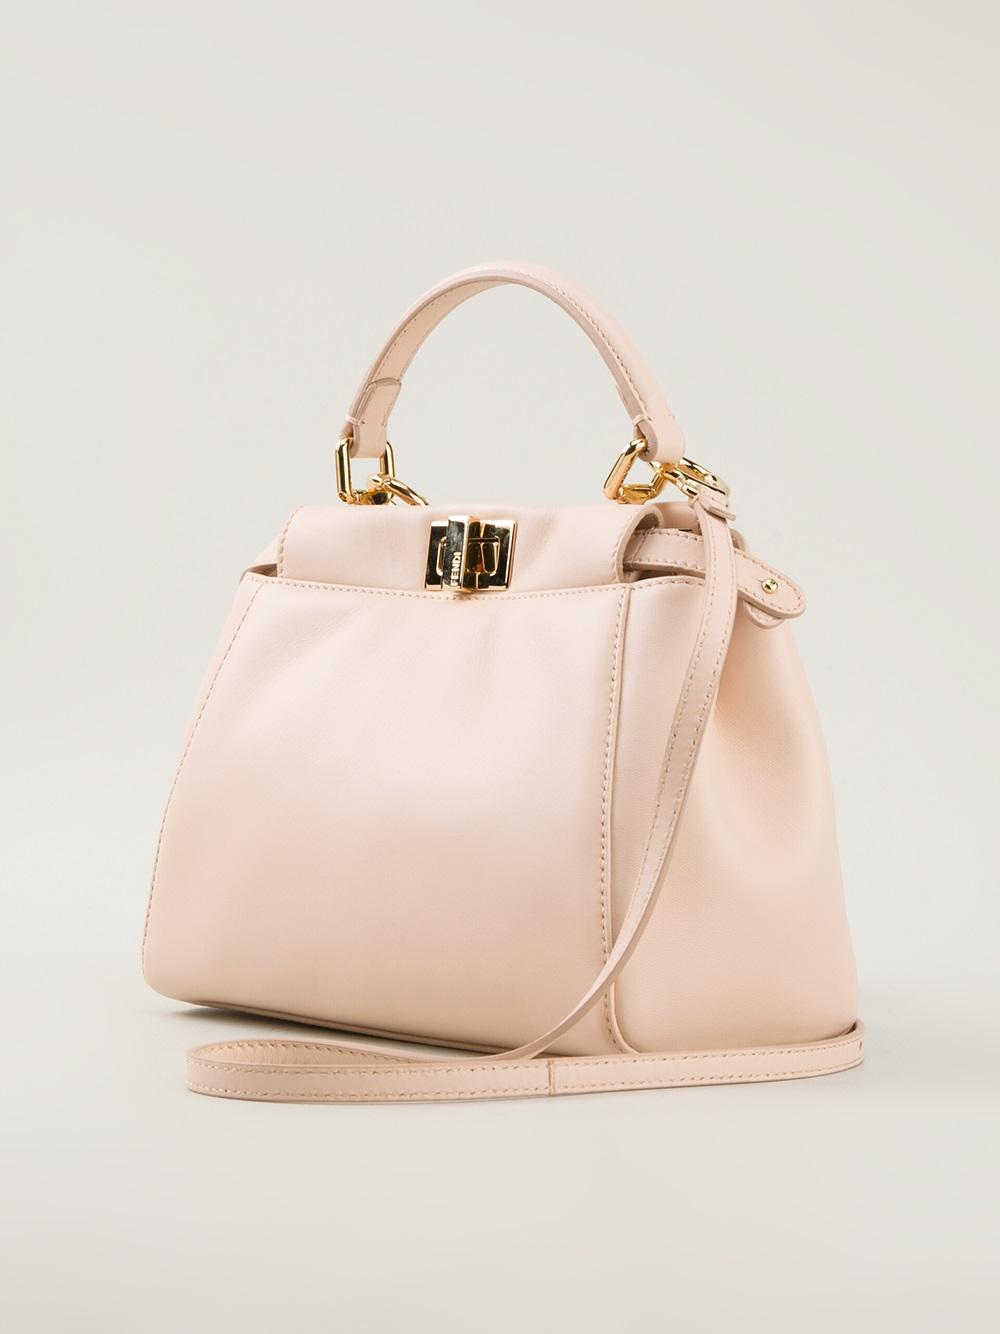 Fendi Peekaboo Small Tote Bag In Pink Lyst